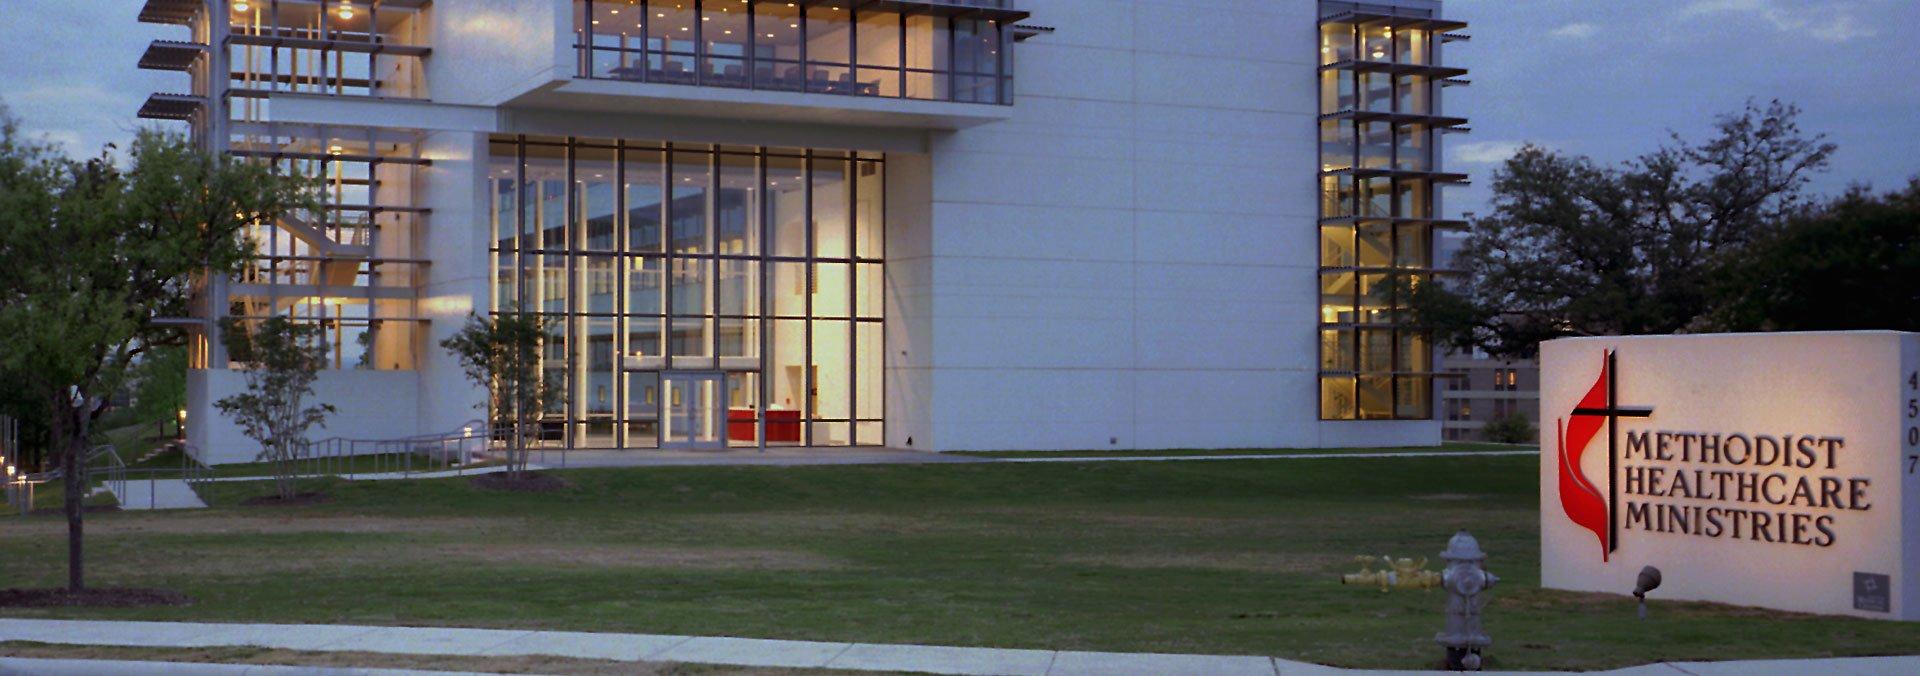 Methodist Healthcare Ministries South Texas Medical Center